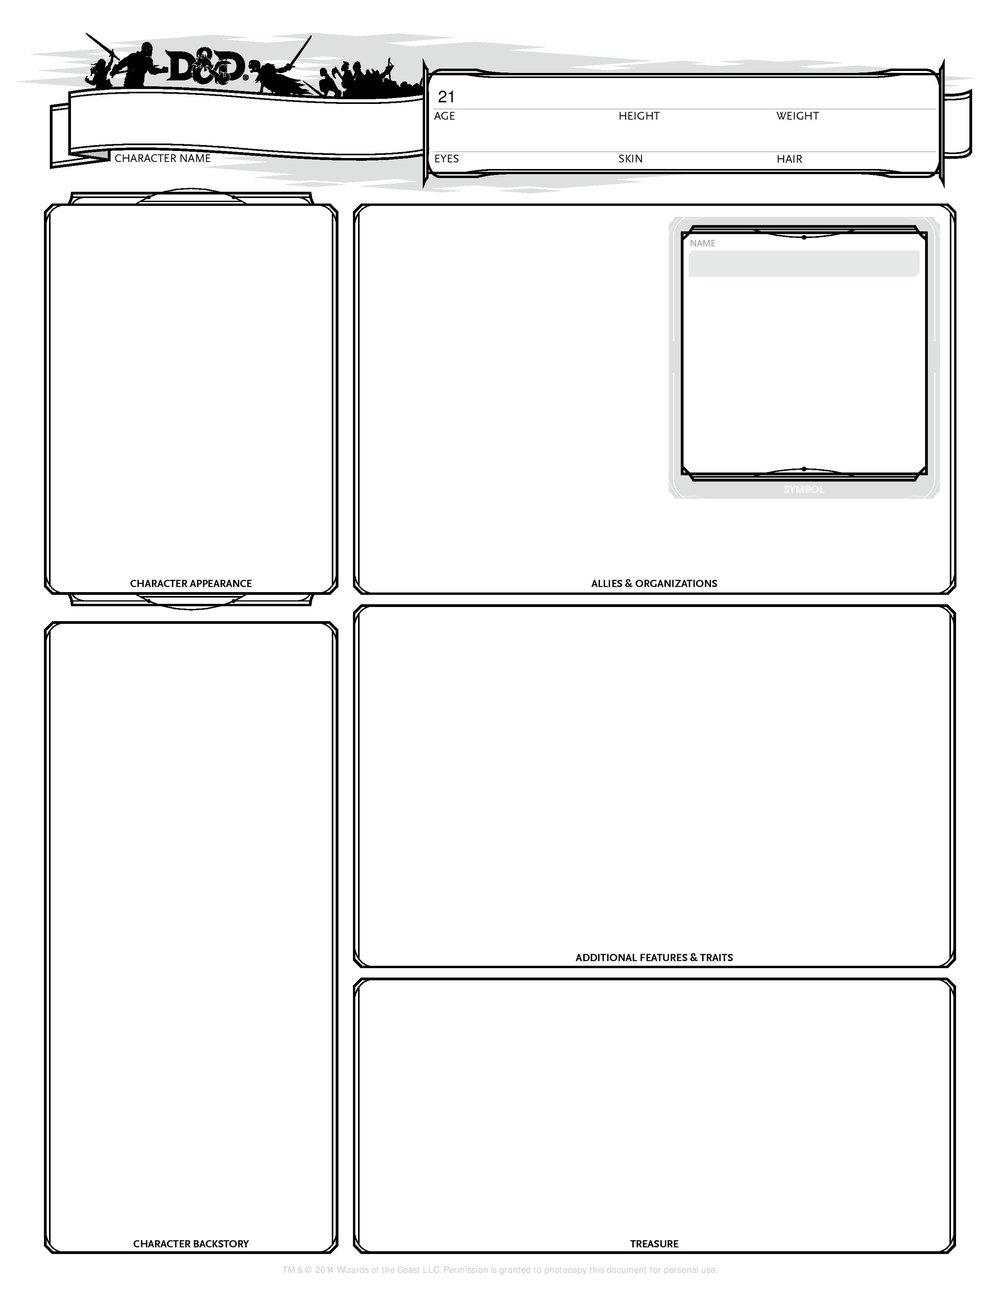 Gretchen Character Sheet Web-page-002.jpg